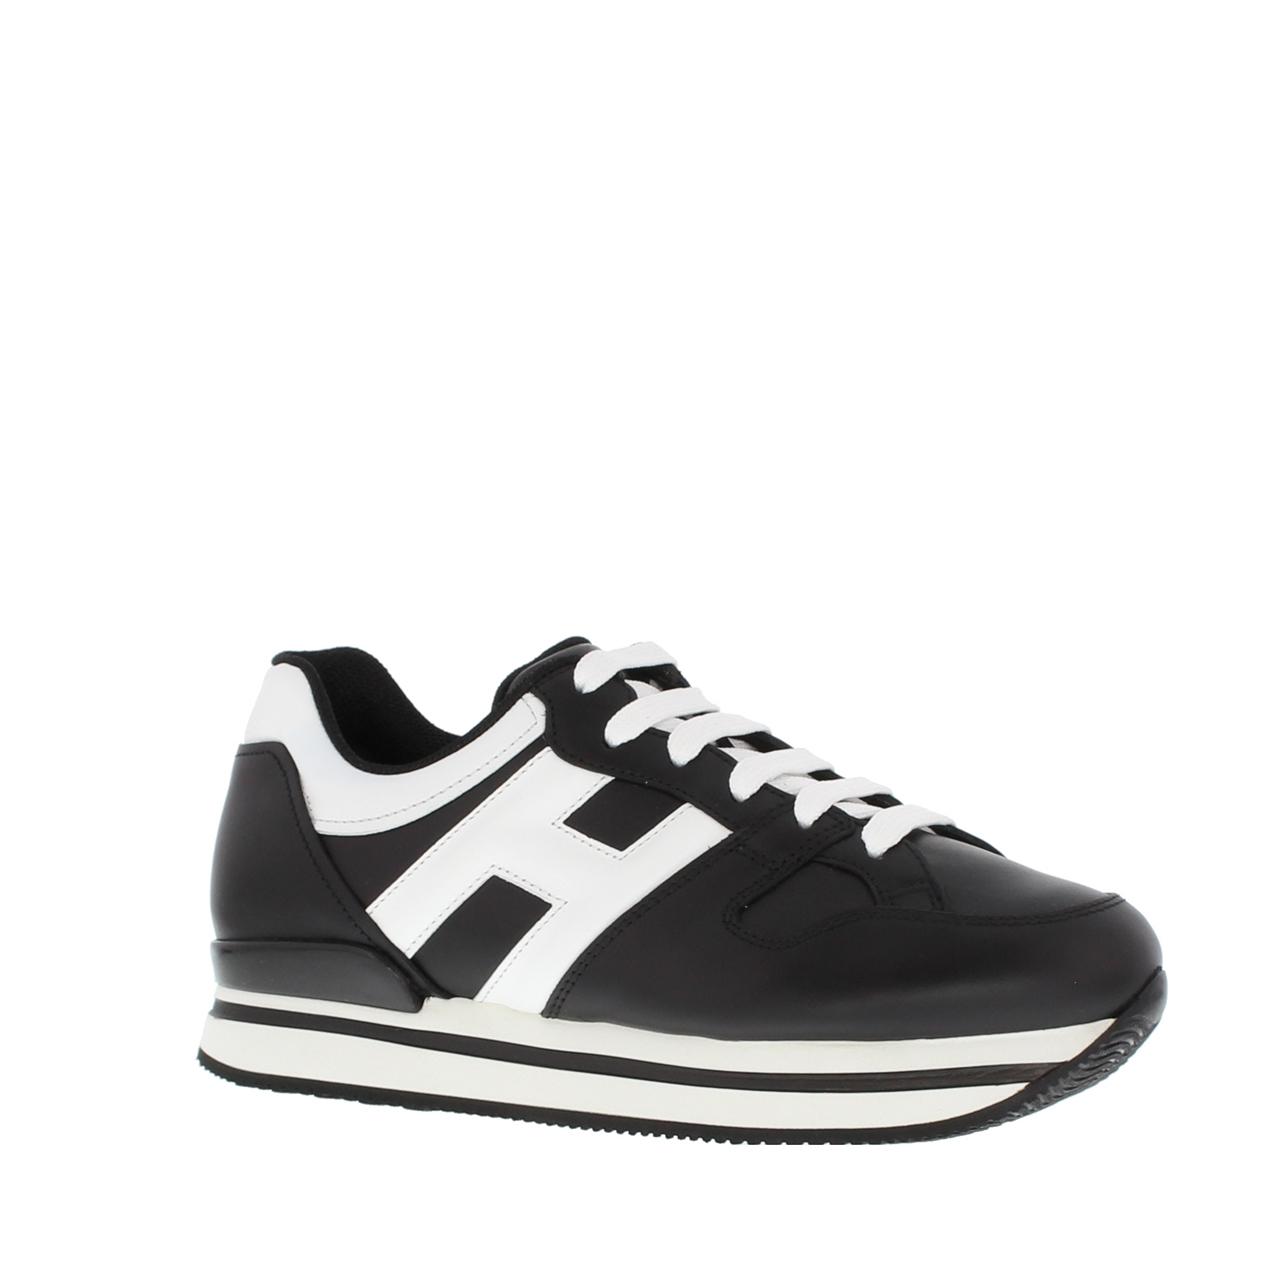 72f6f0c69fc Hogan HXW222OT548   Strating schoenen